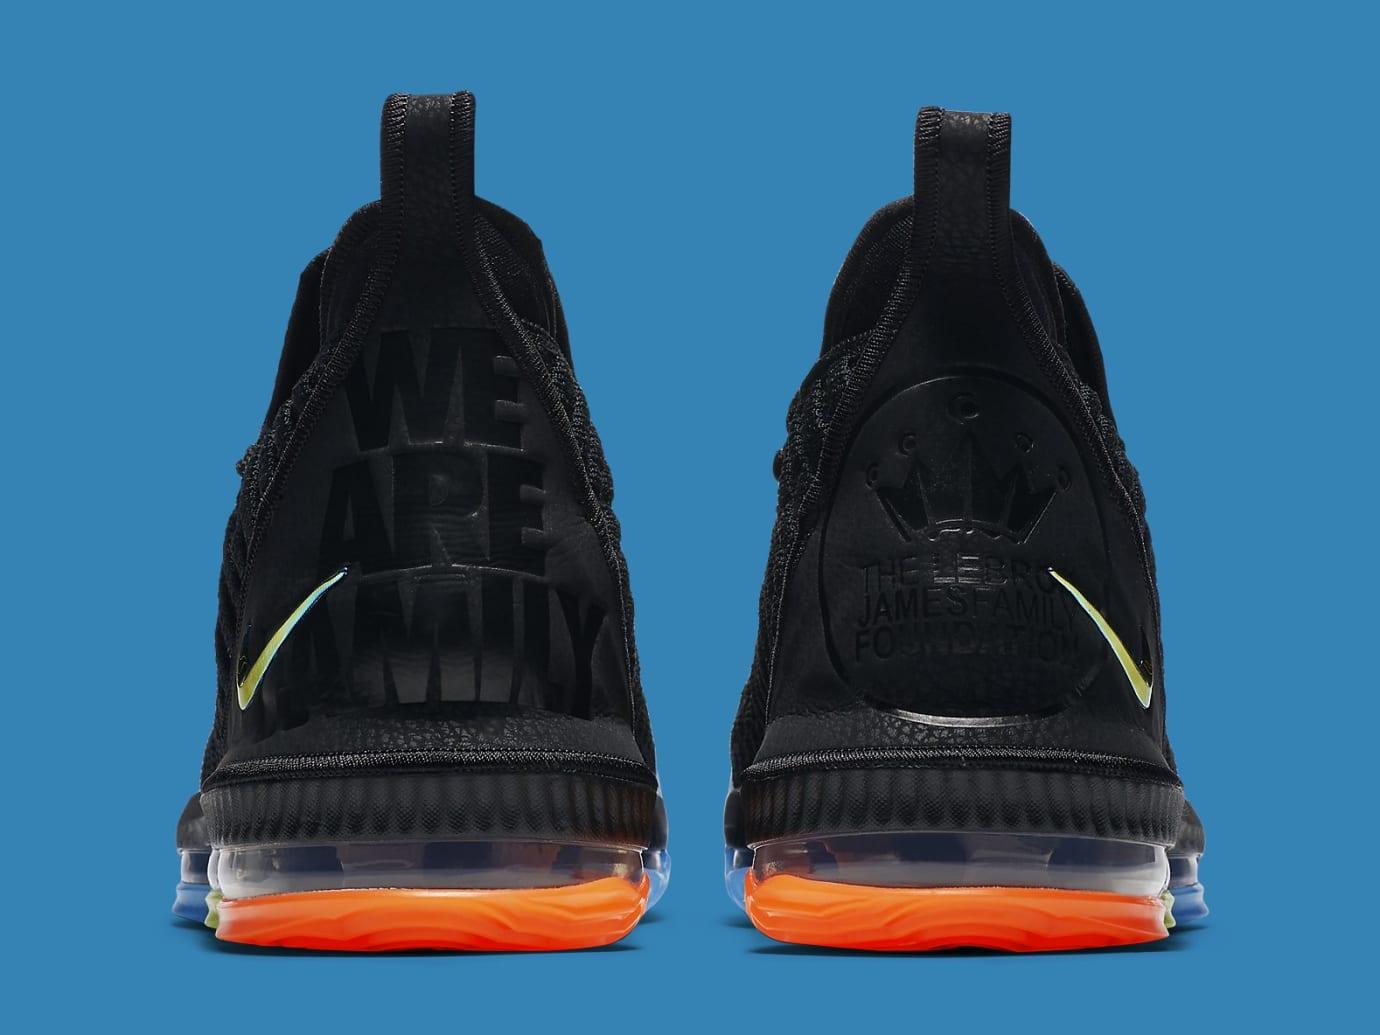 buy online 9758f 8816f Image via Nike Nike LeBron 16 I Promise Release Date AO2595-004 Heel